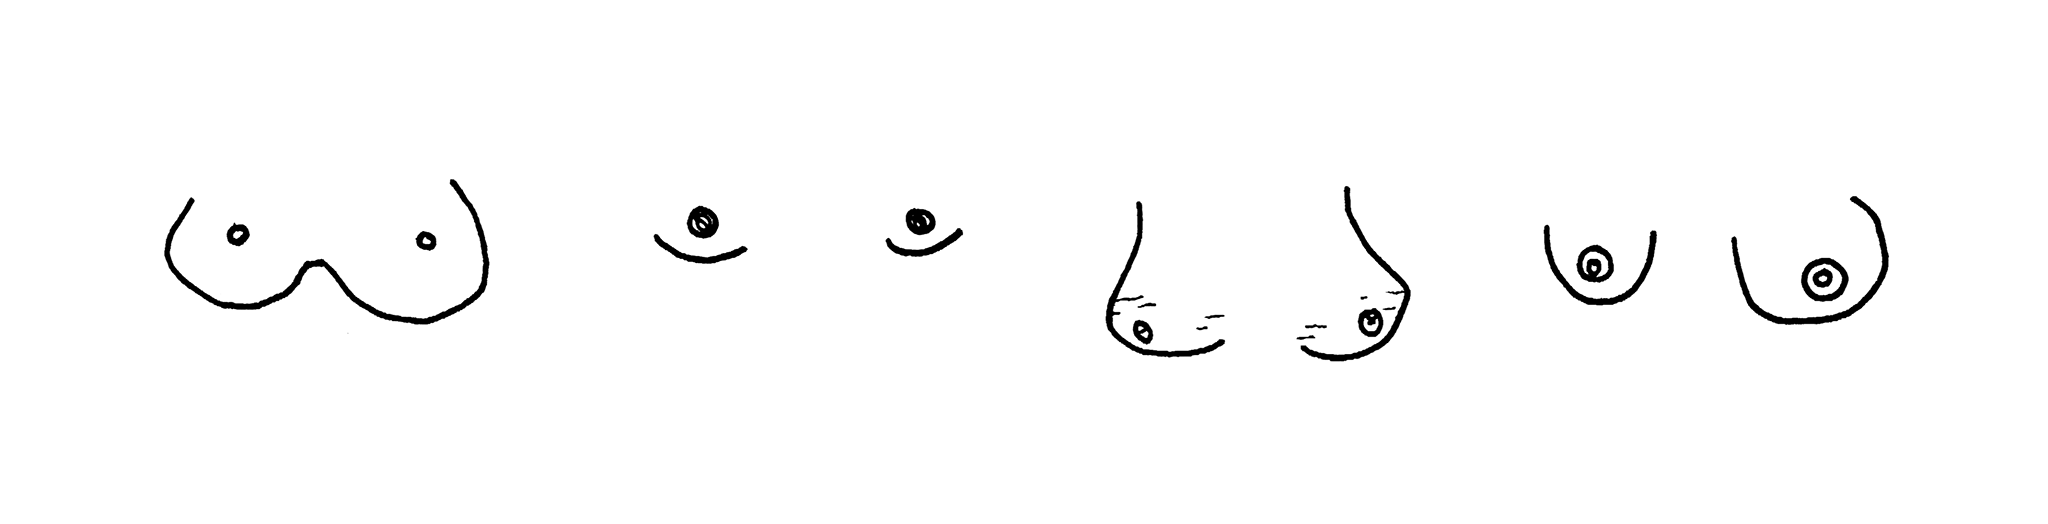 didikotani, boobs drawing